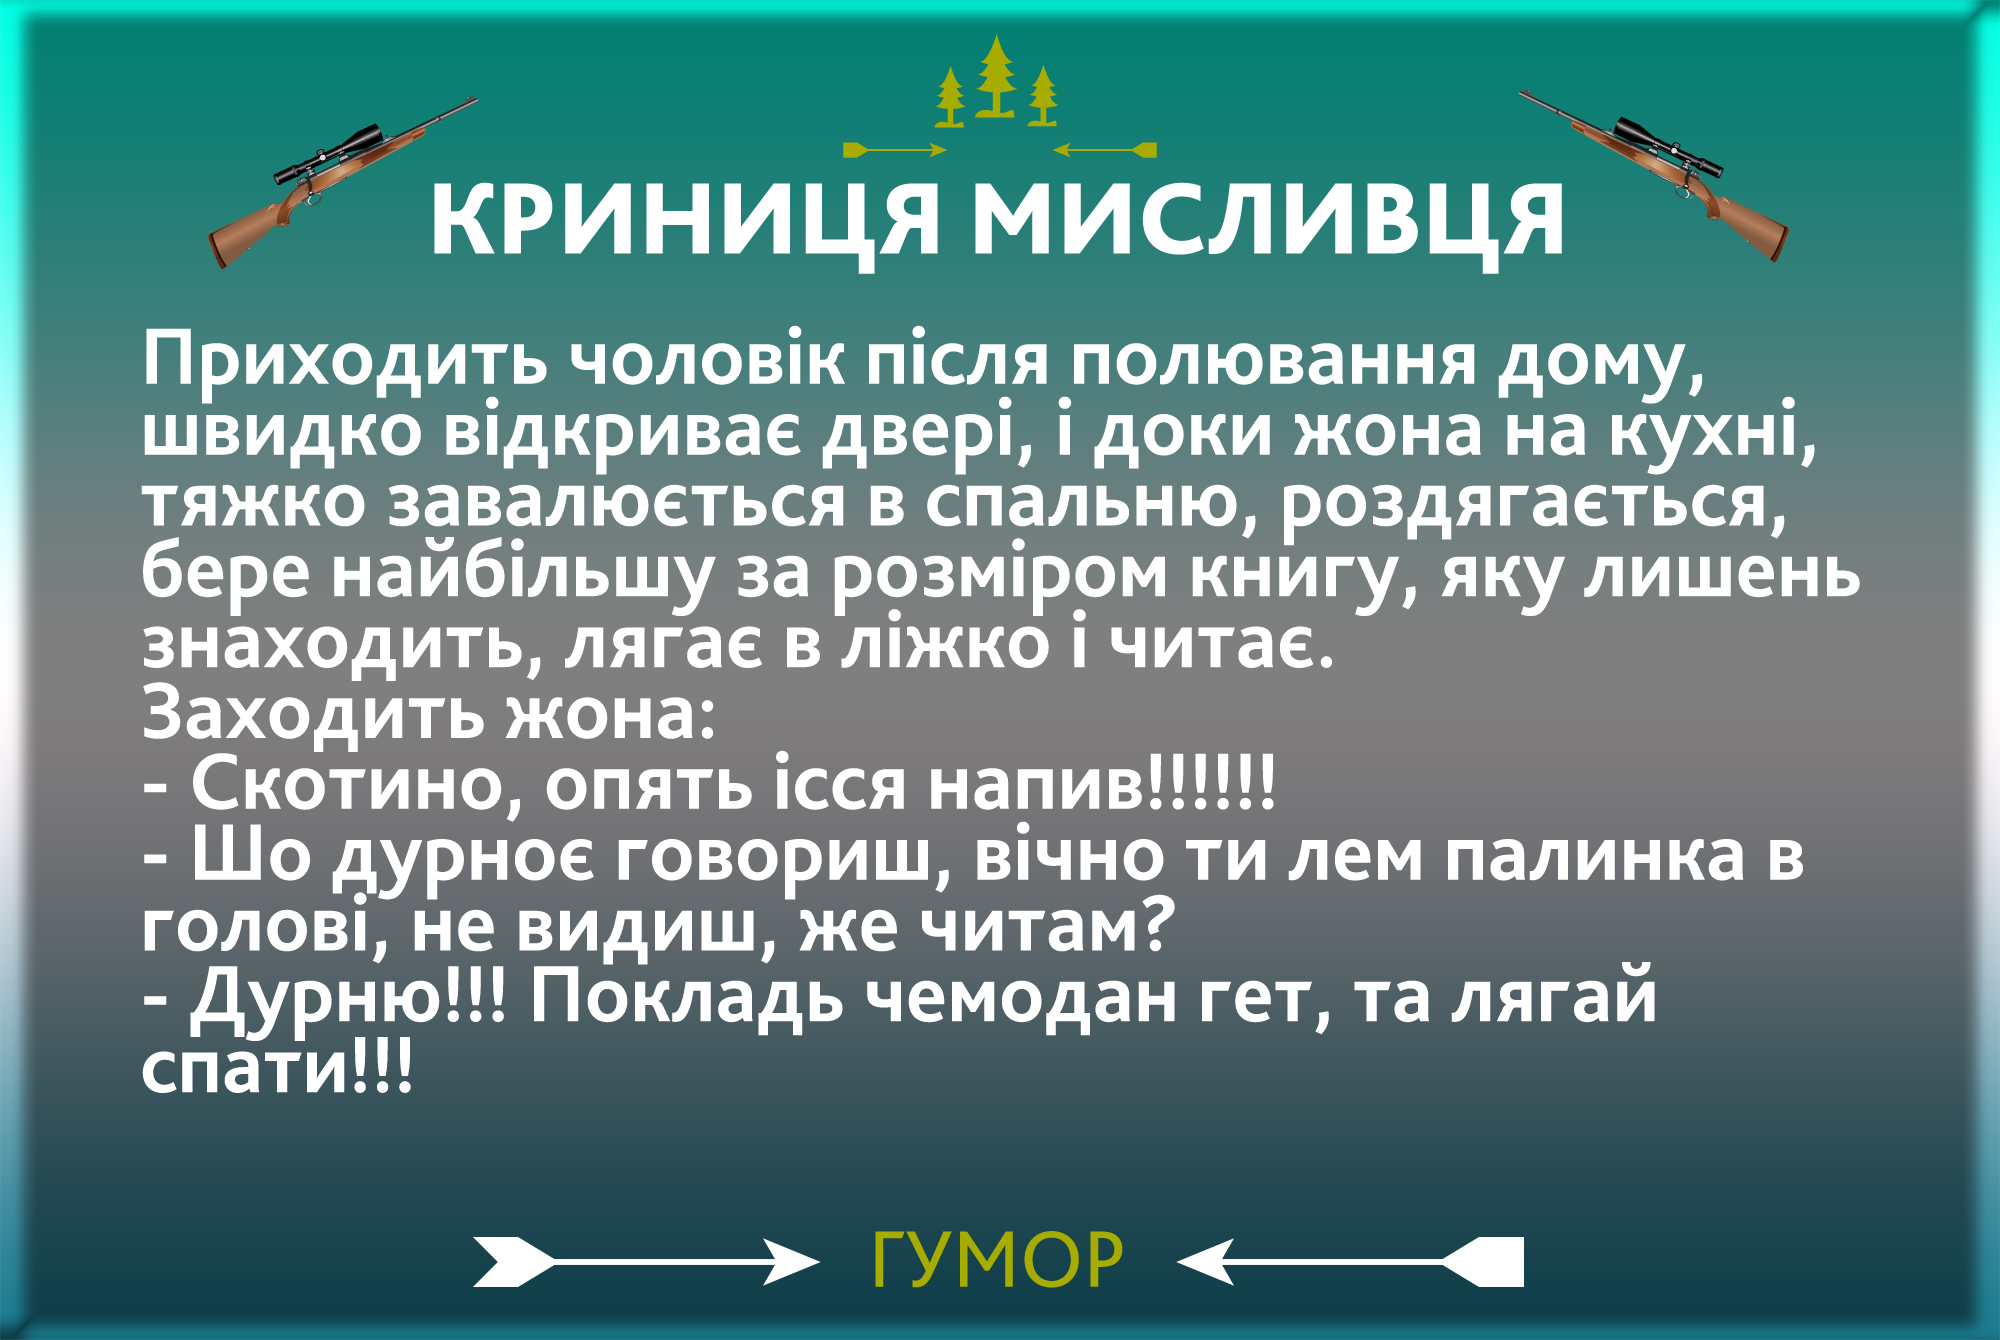 криниця_ГУМОР_03_01_2016_23_23